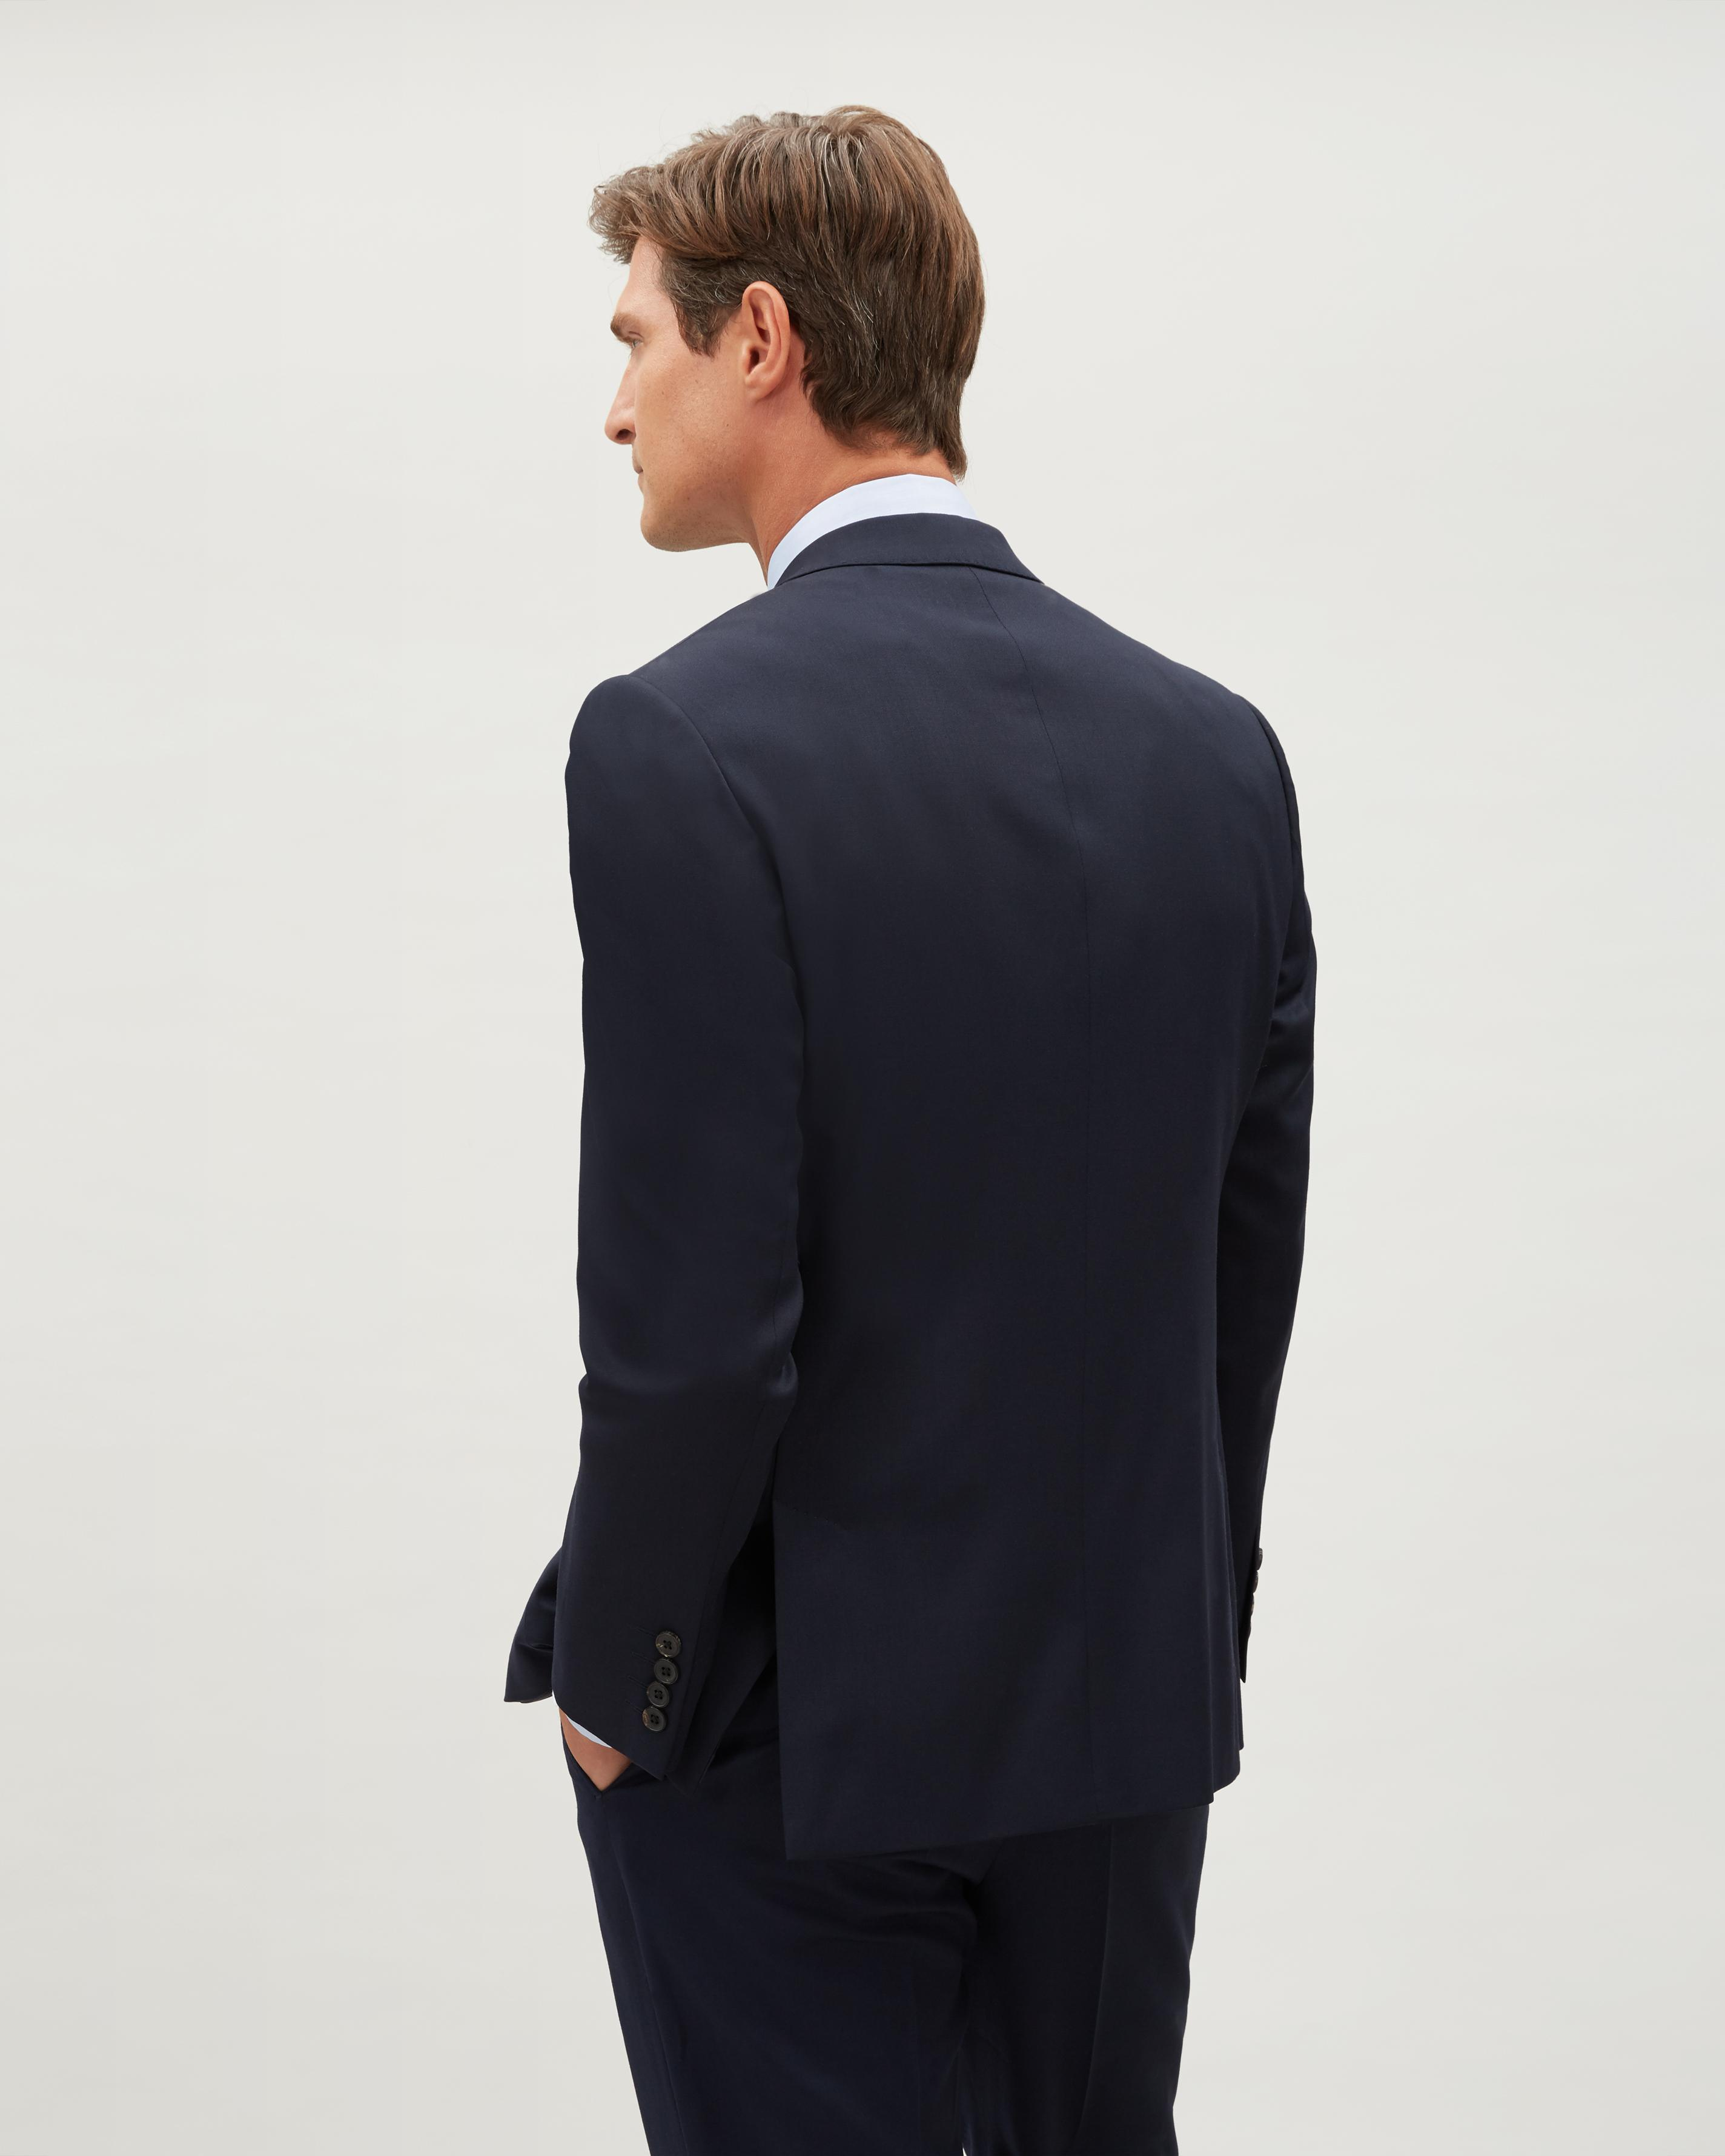 Jaeger Regular Wool Plain Twill Jacket in Navy (Blue) for Men